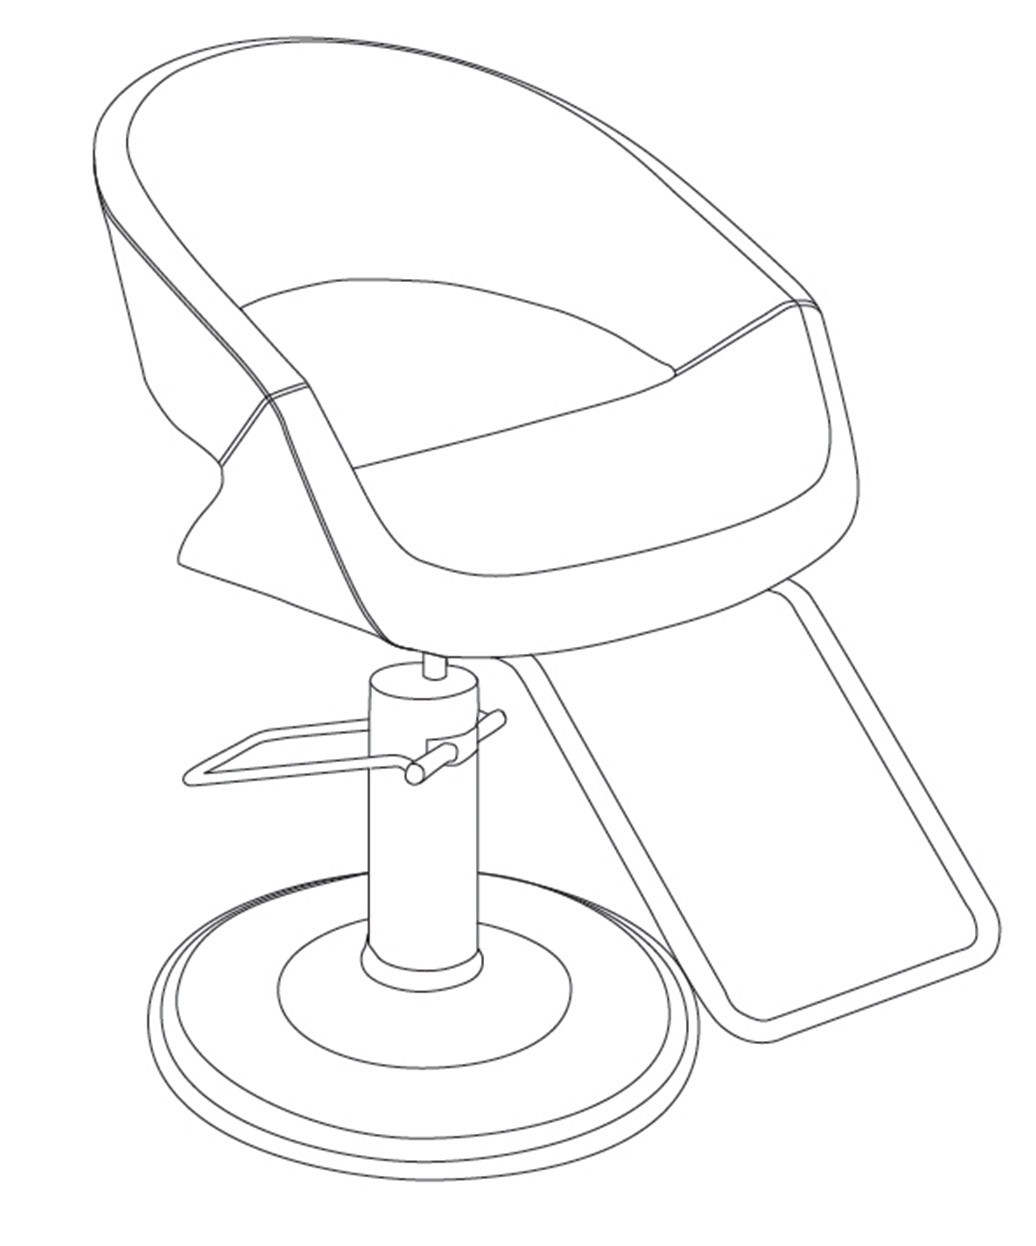 Takara Belmont ST-M80 Caruso Styling Chair